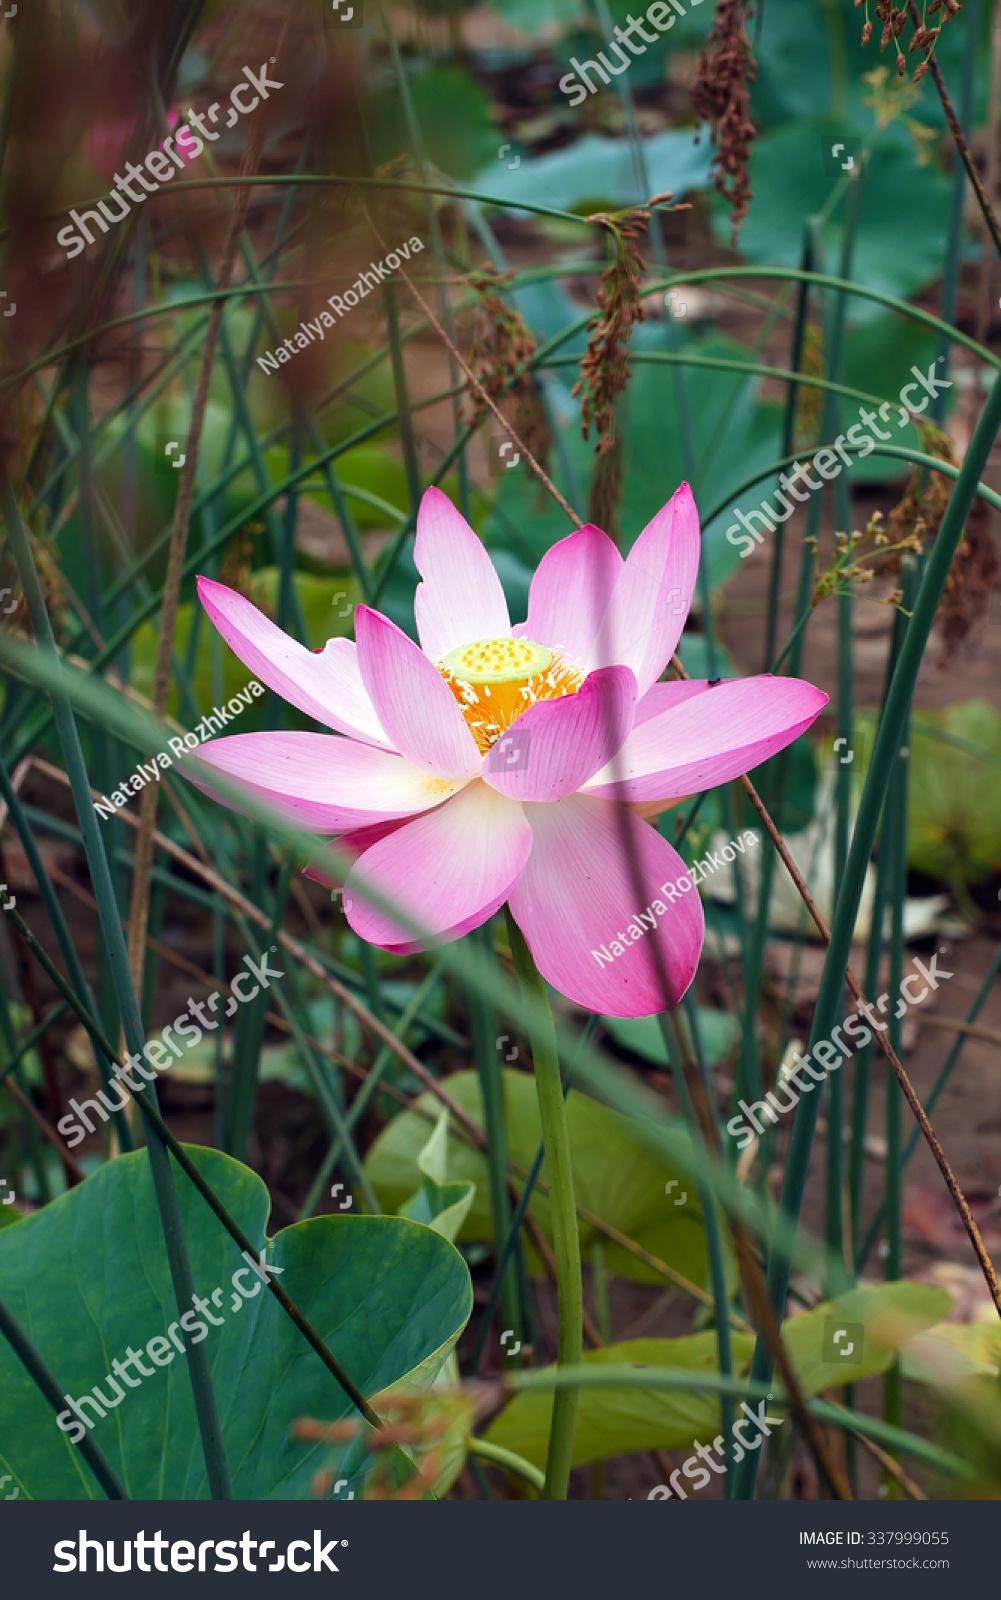 Royalty Free Lotus Flower Rare Flower Ancient 337999055 Stock